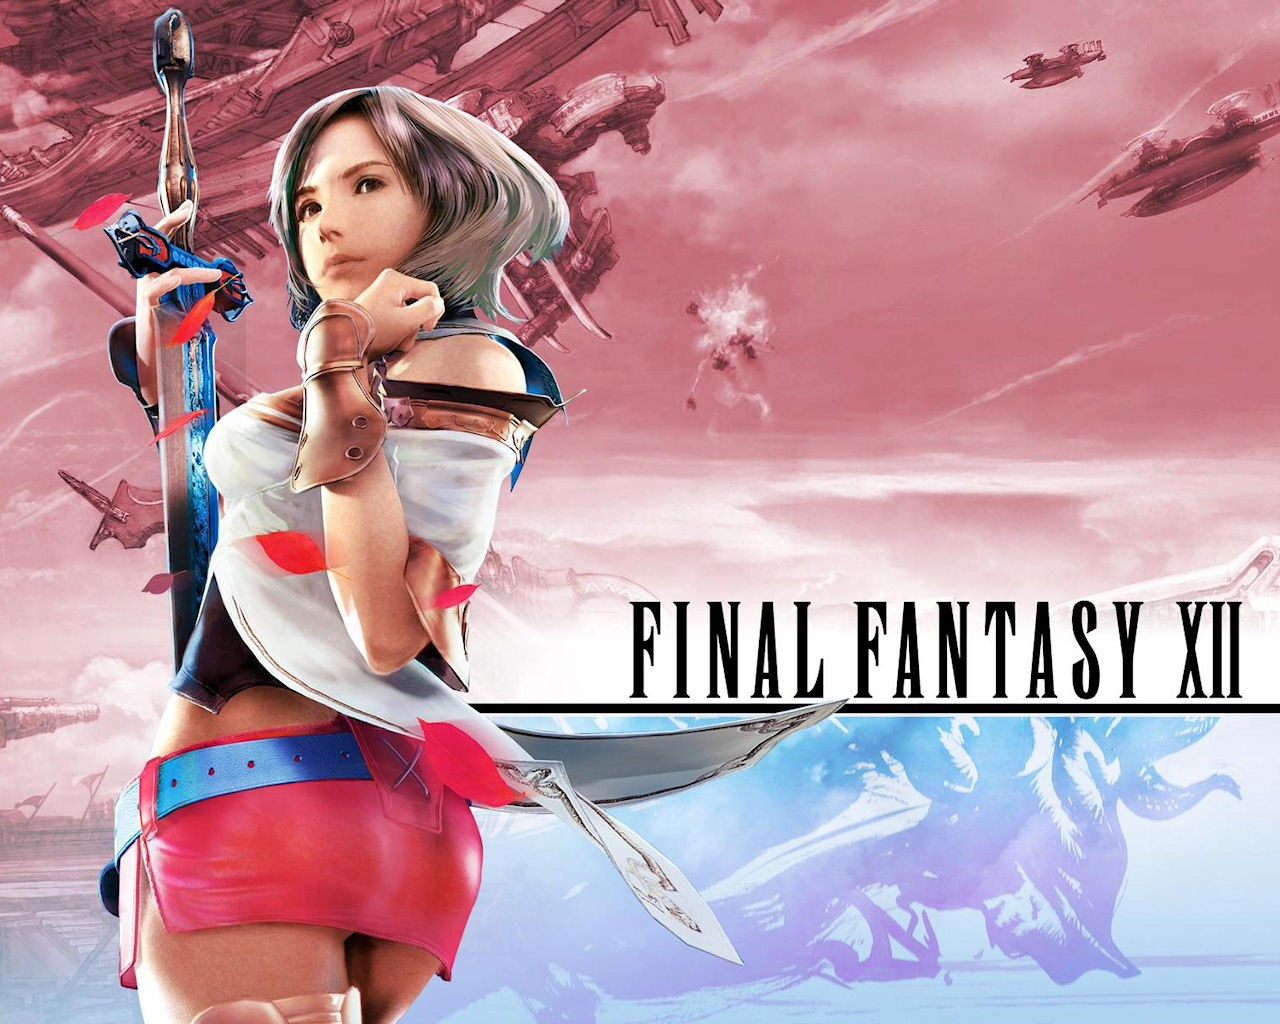 Anime 1280x1024 video games Final Fantasy XII ass anime girls anime video game art